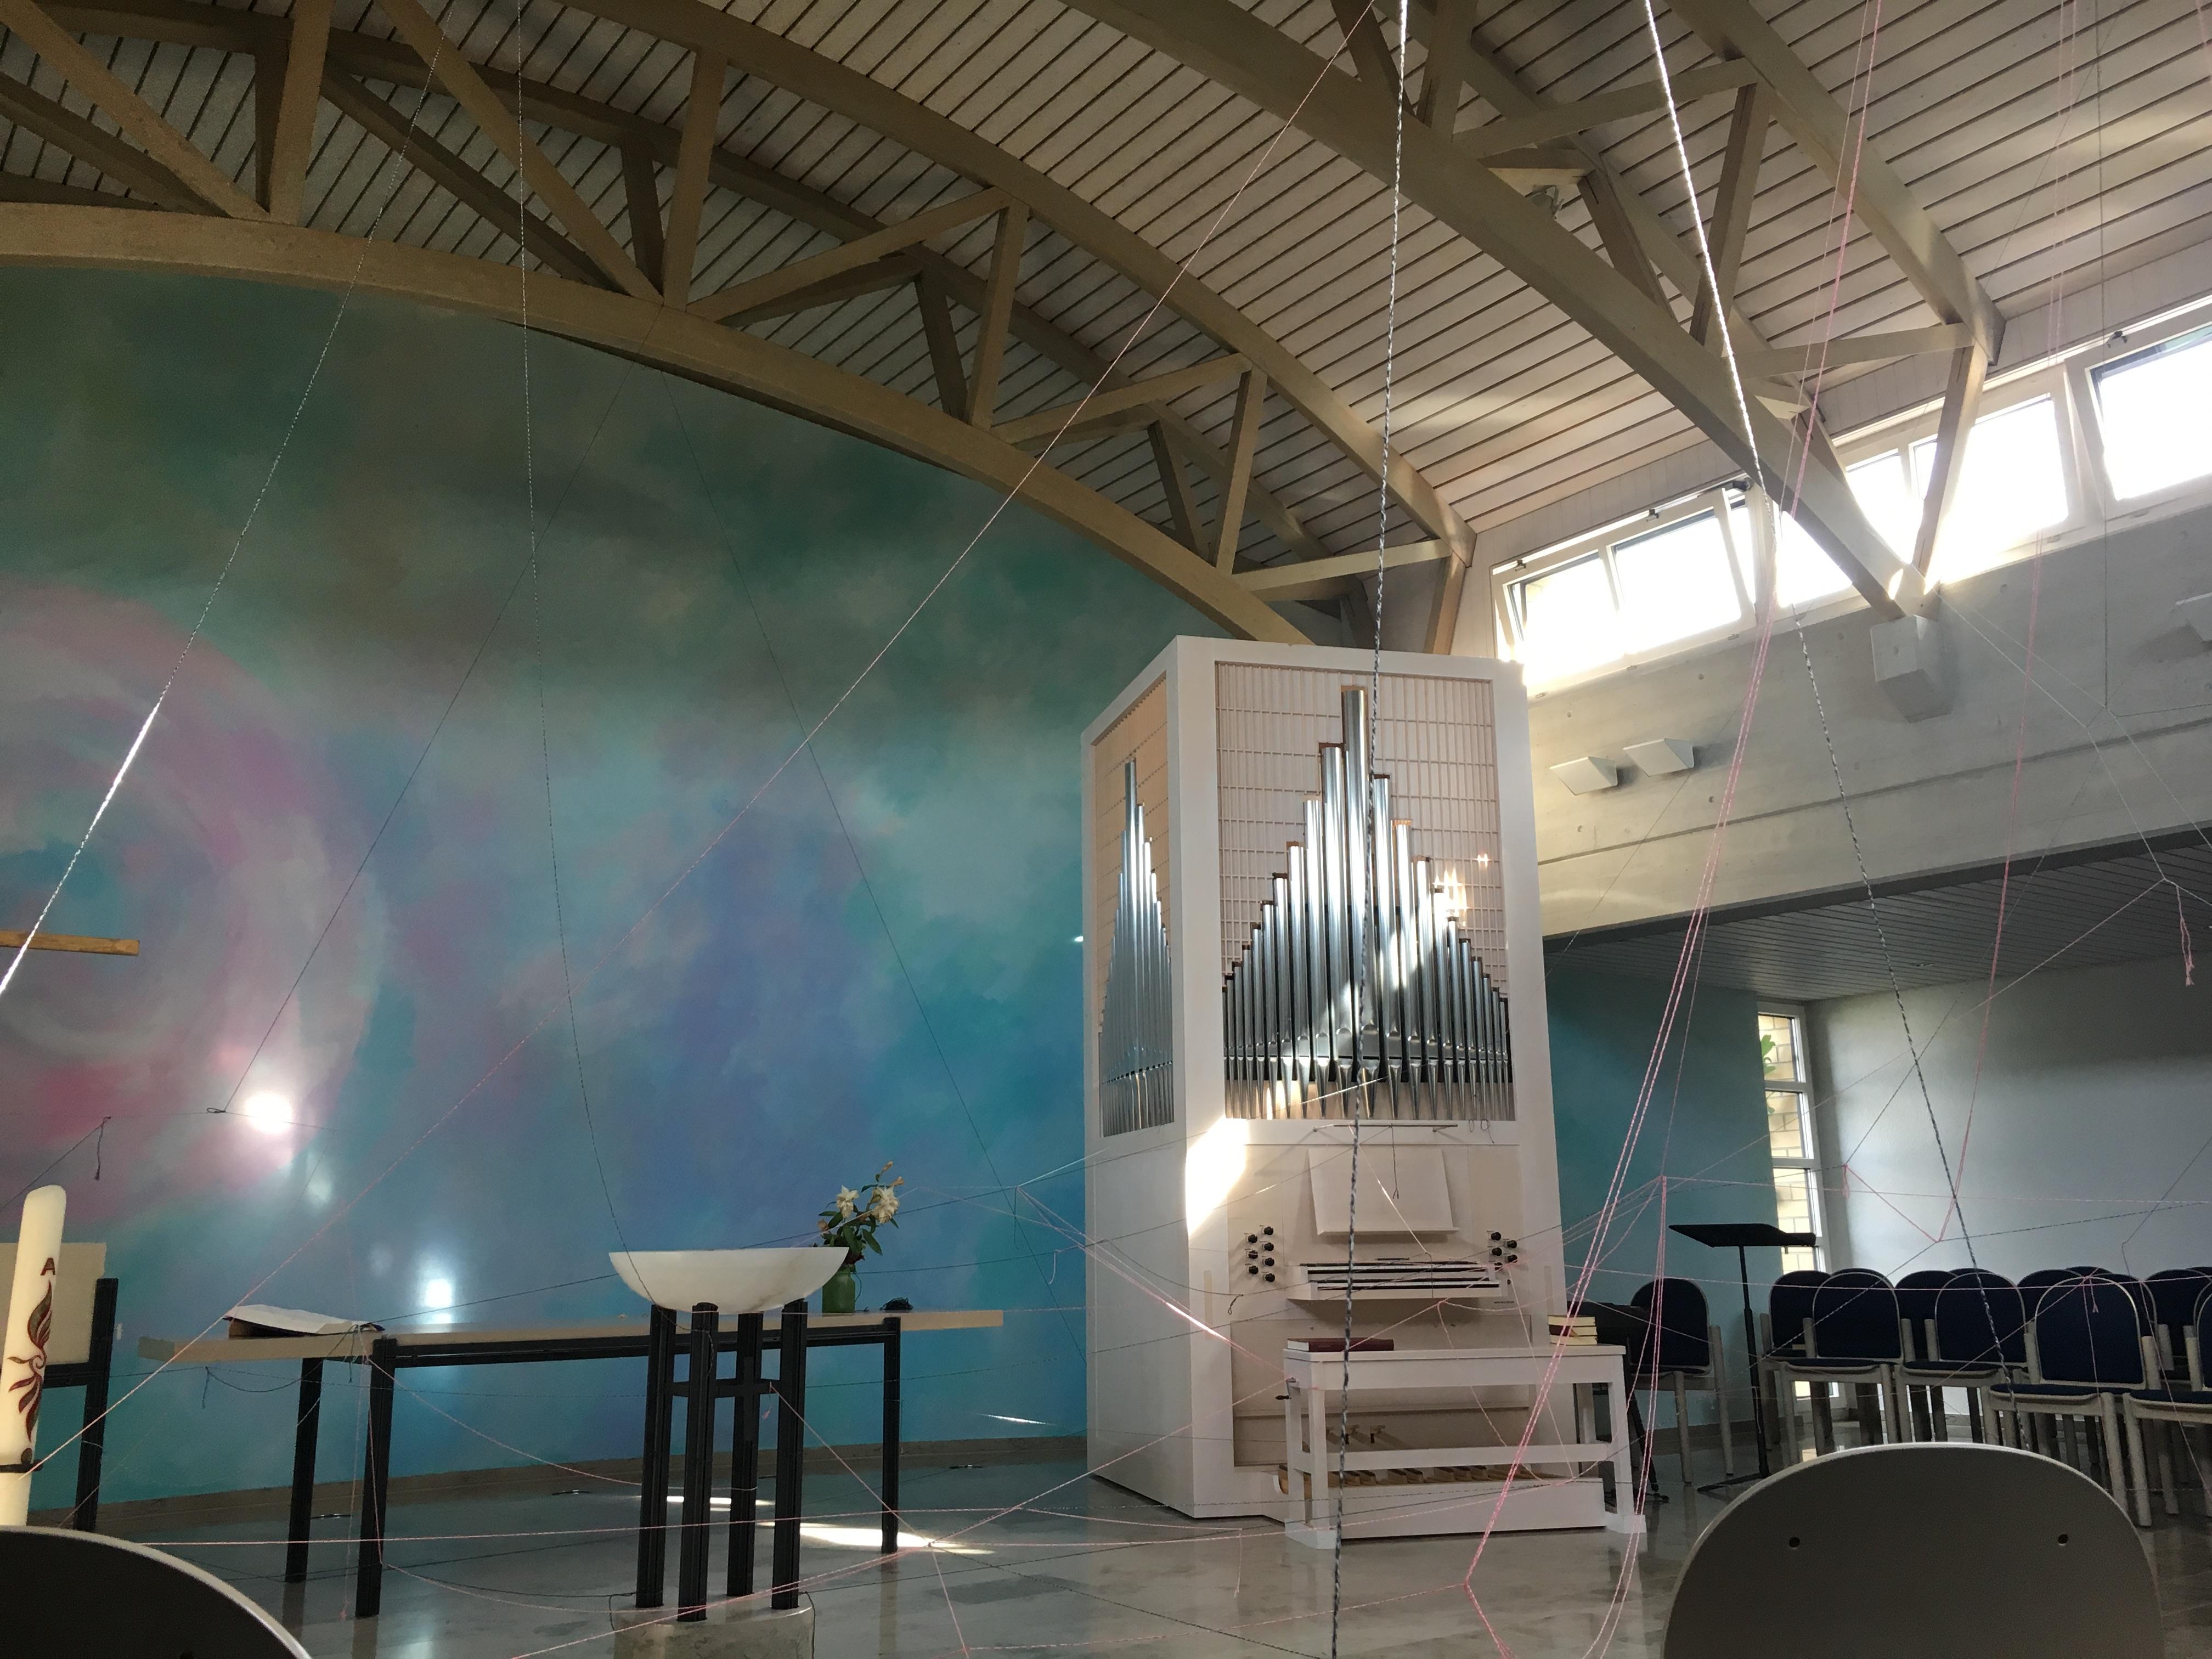 Verknüpfte Kirche Reformierte Kirche Stallikon Wettswil